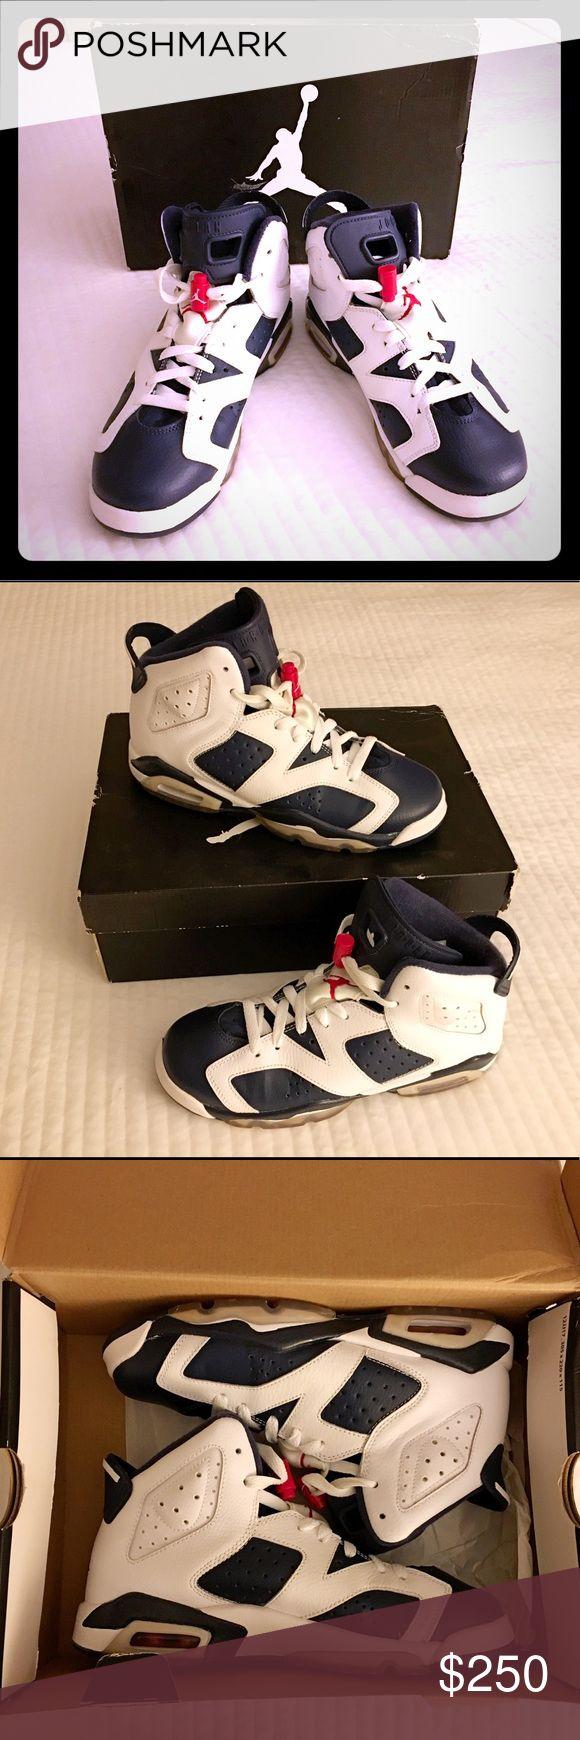 Air Jordan Retro 6 (Olympic 2012) Size 5.5. Like new w/ original box Air Jordan Shoes Athletic Shoes